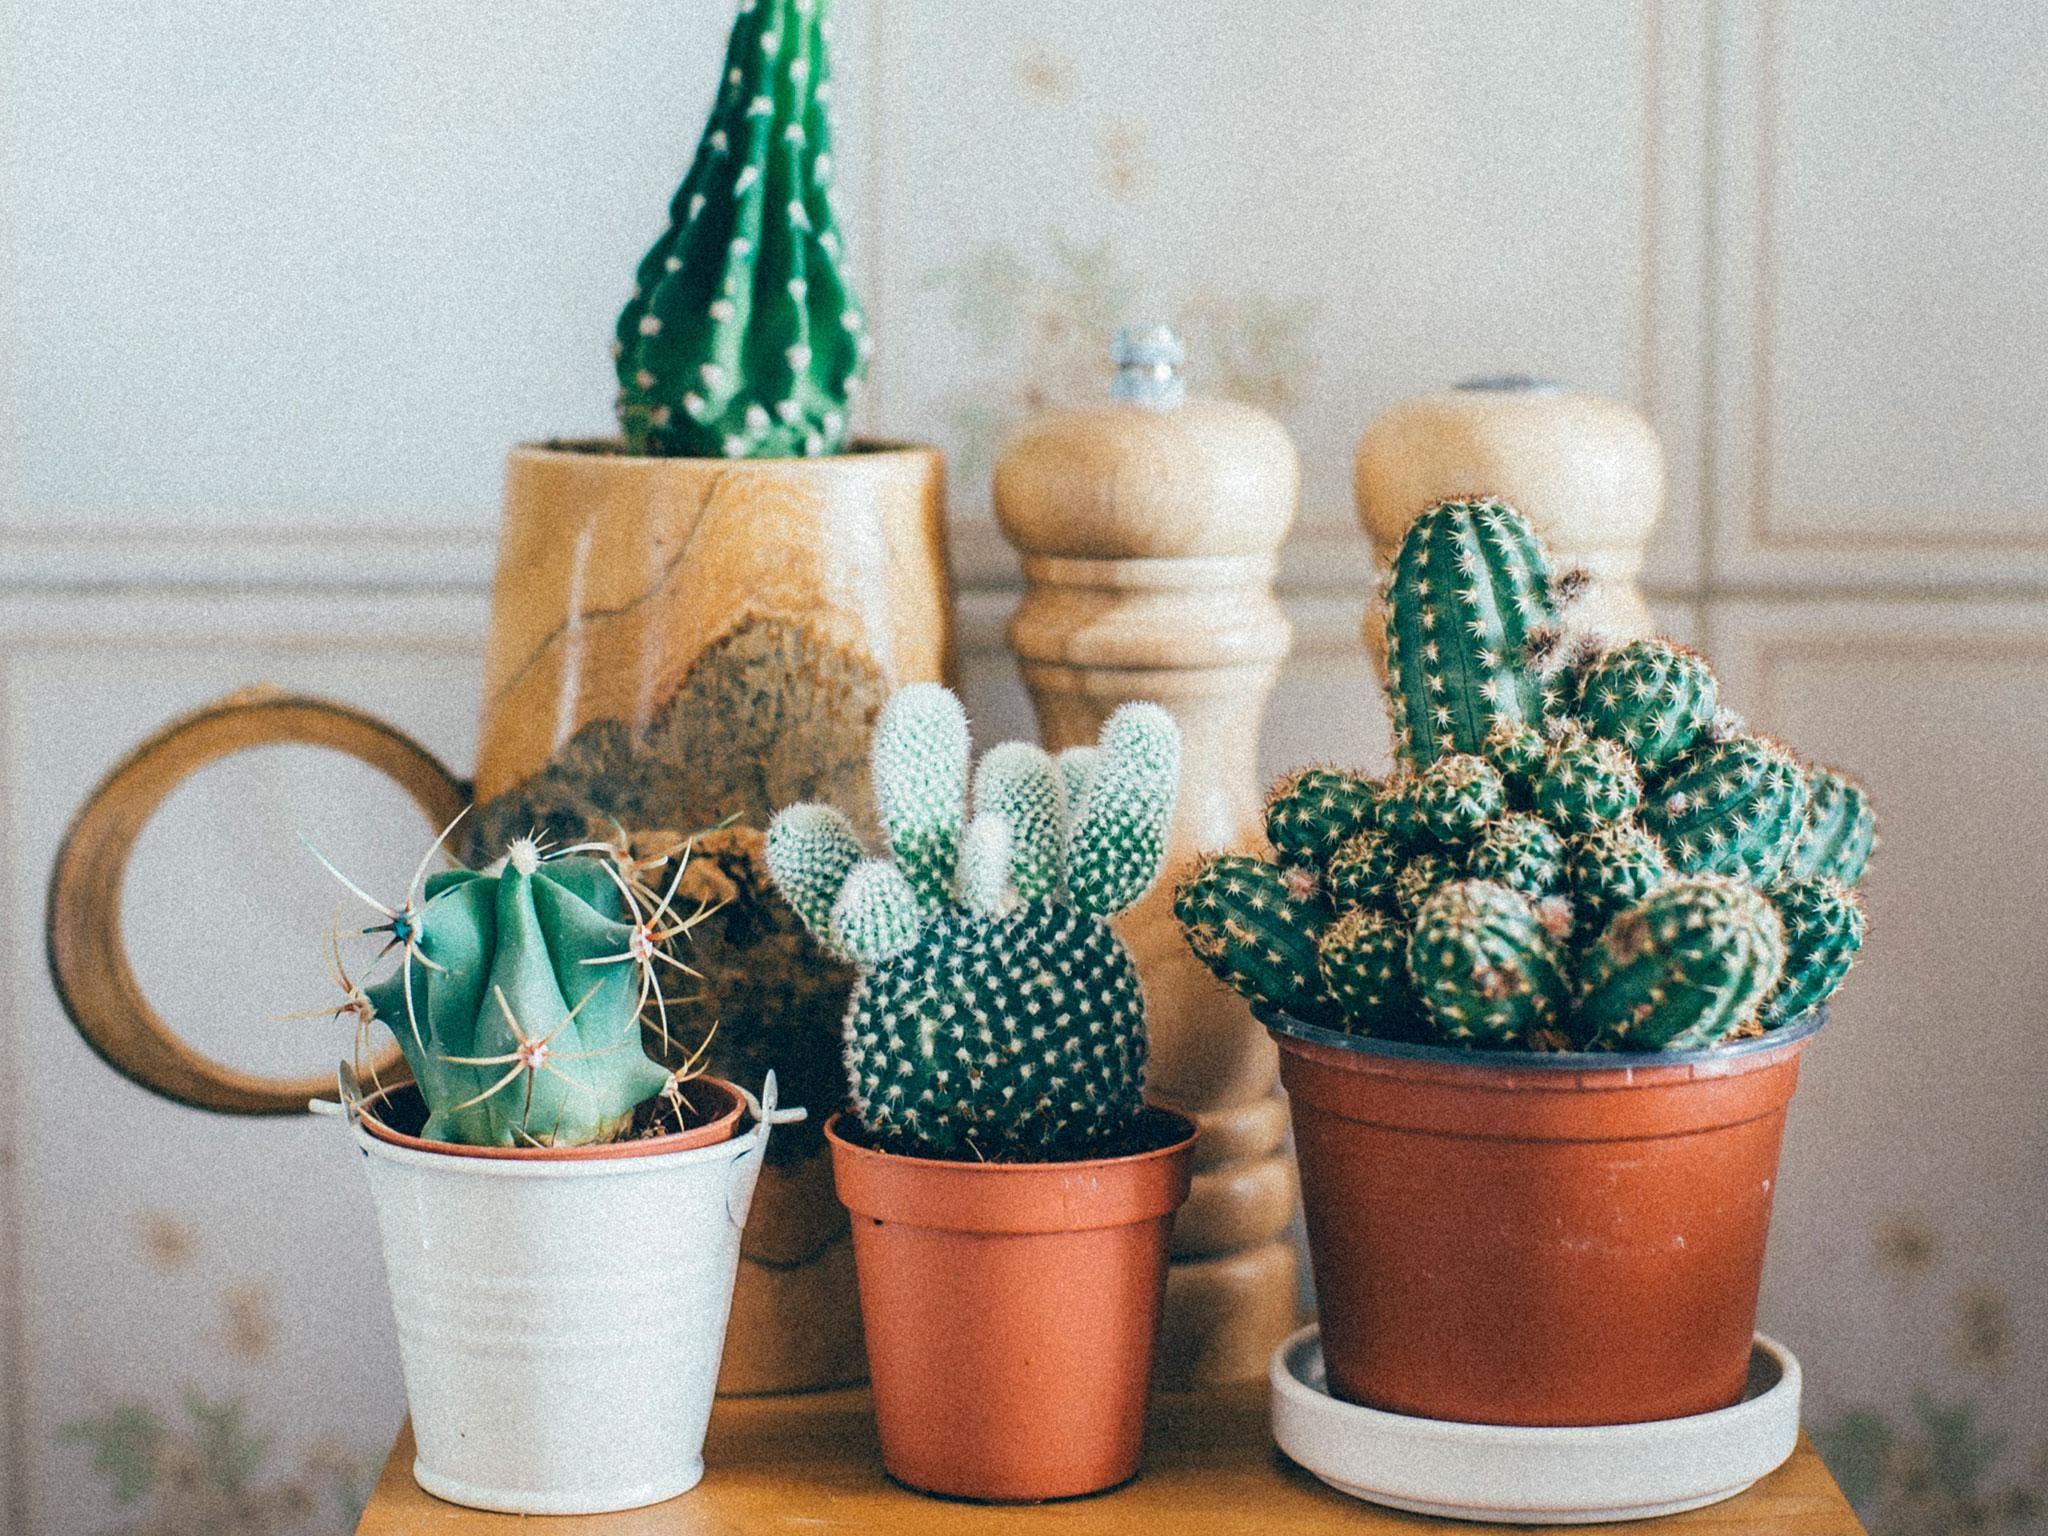 Observe Your Cactus